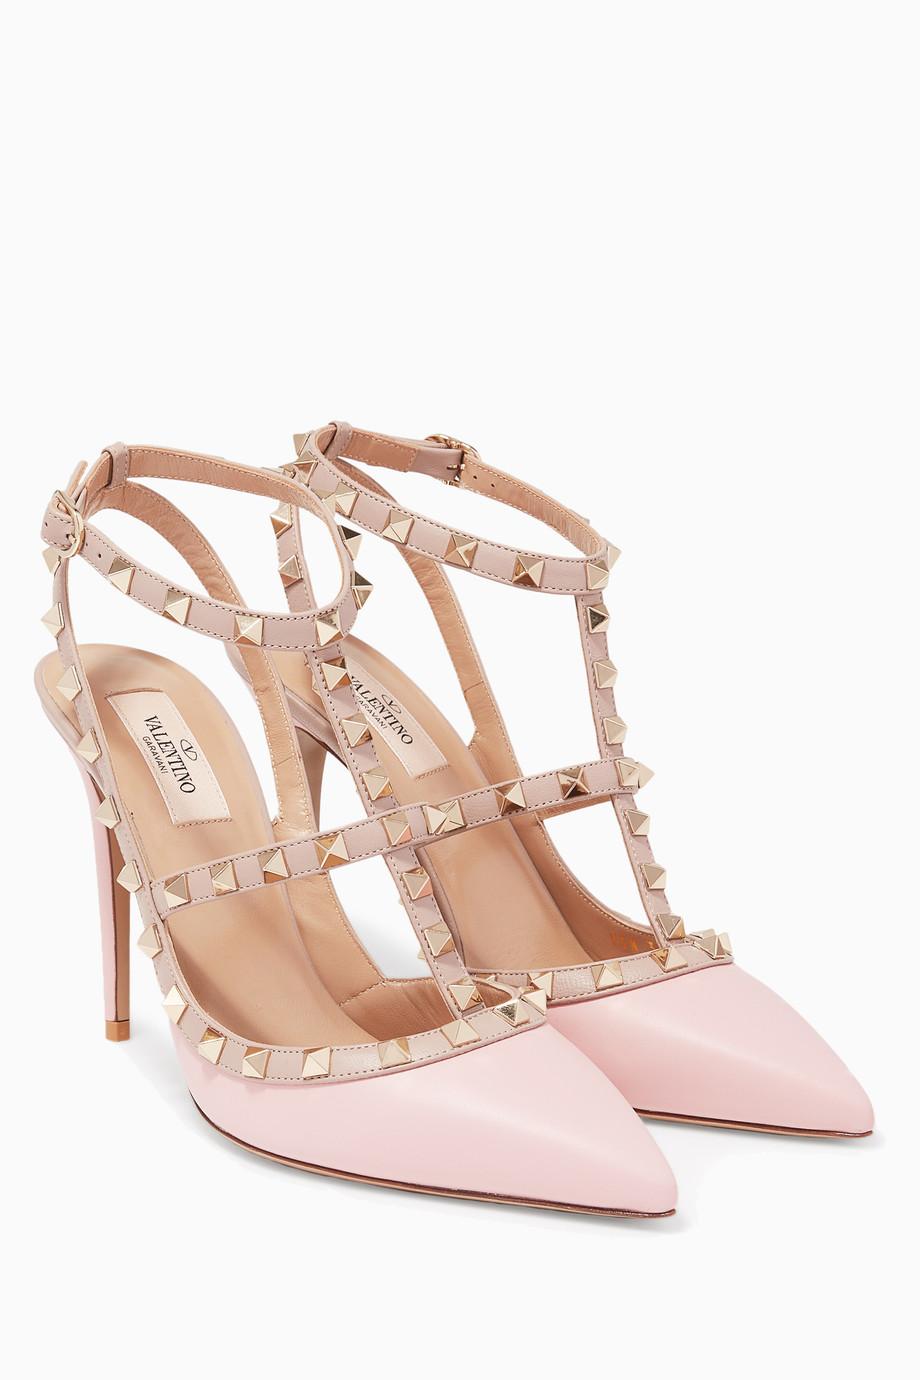 ee3dbdb6d3c0 Shop Valentino Pink Light Pink Single-Strap Rockstud Pumps for Women ...